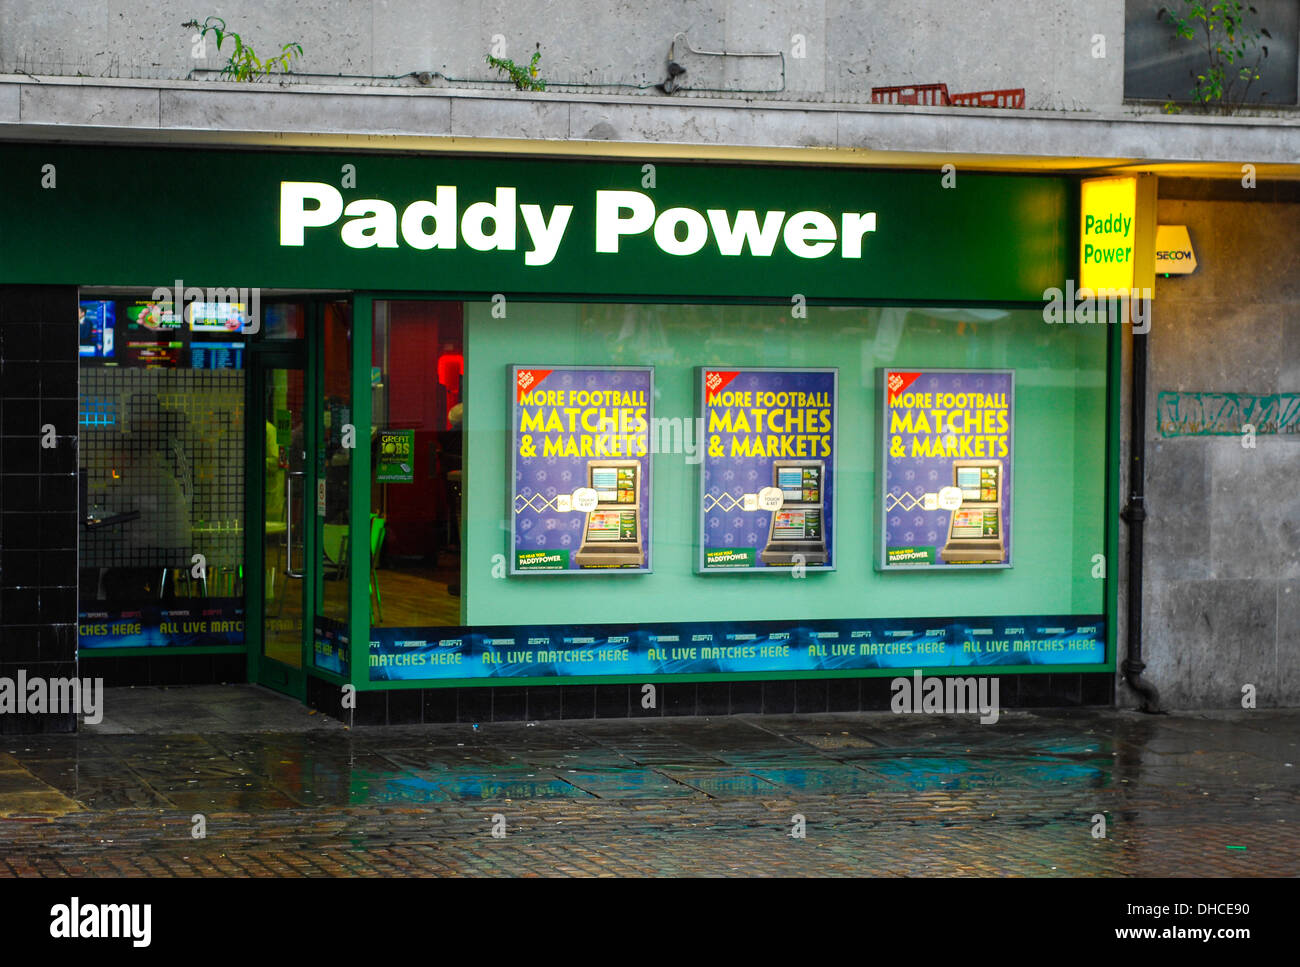 Paddy power betting shop stock image